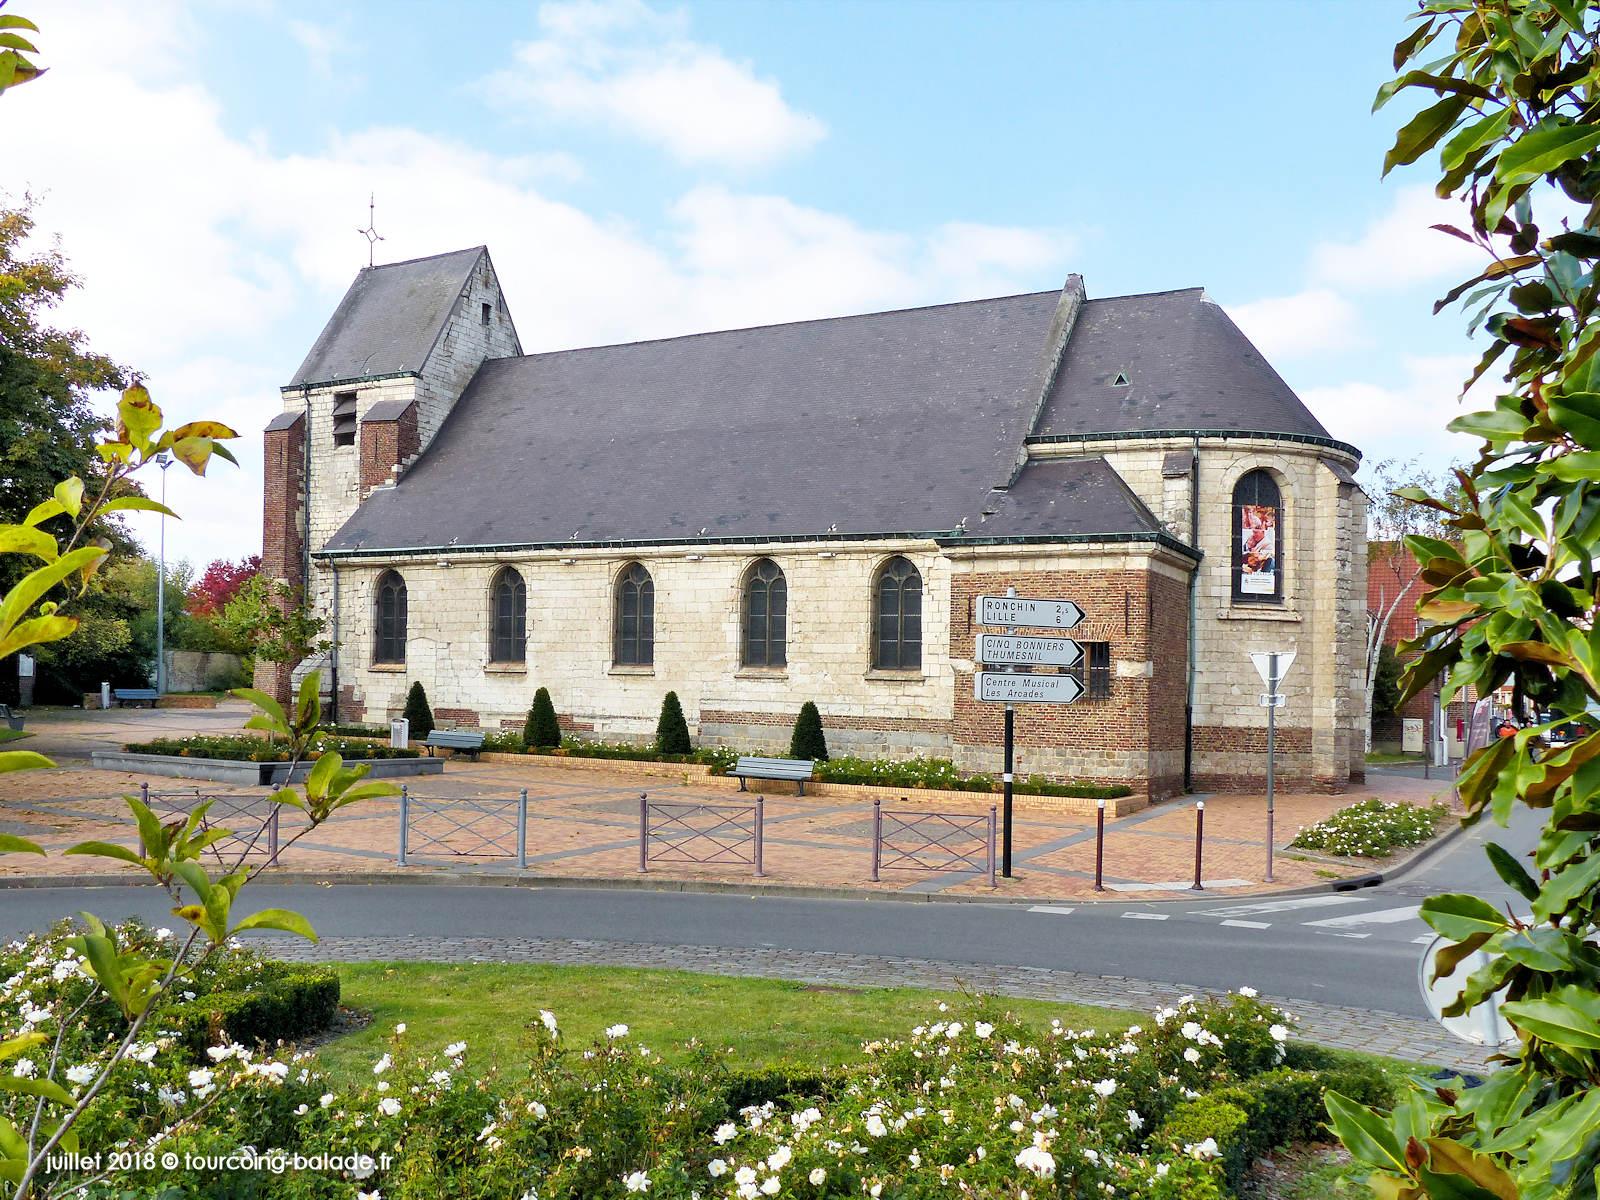 Église Sainte Marguerite d'Antioche, Faches-Thumesnil, 2018